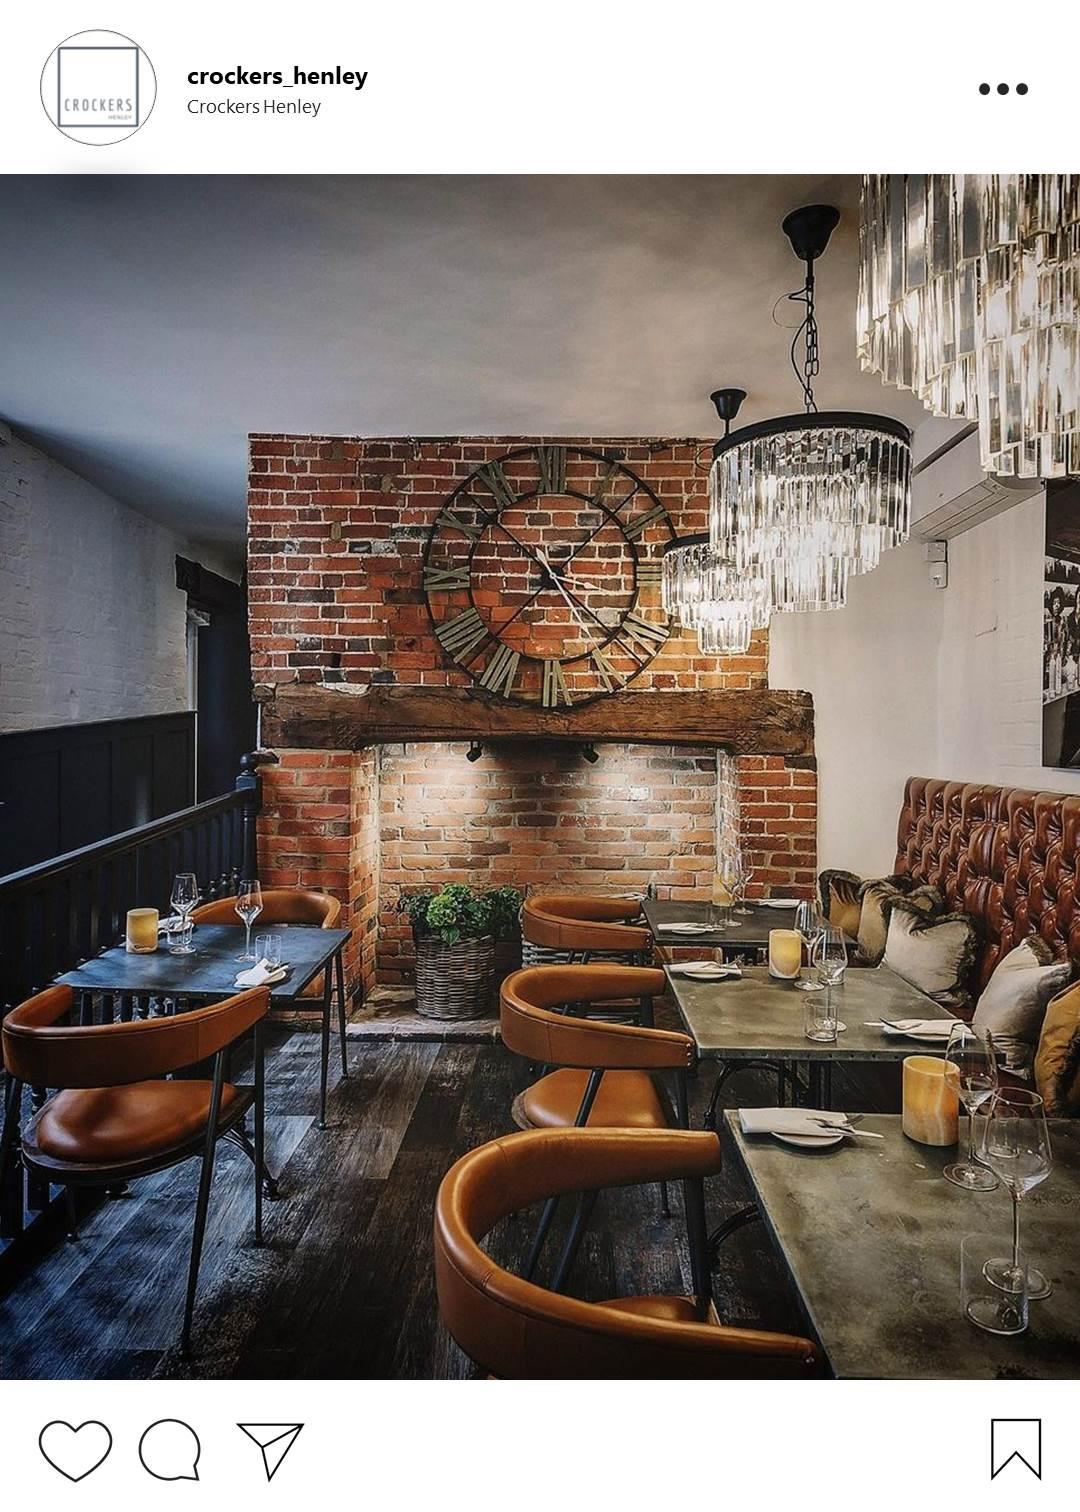 Instaworthy restaurants in Oxfordshire - Crockers, Henley-on-Thames